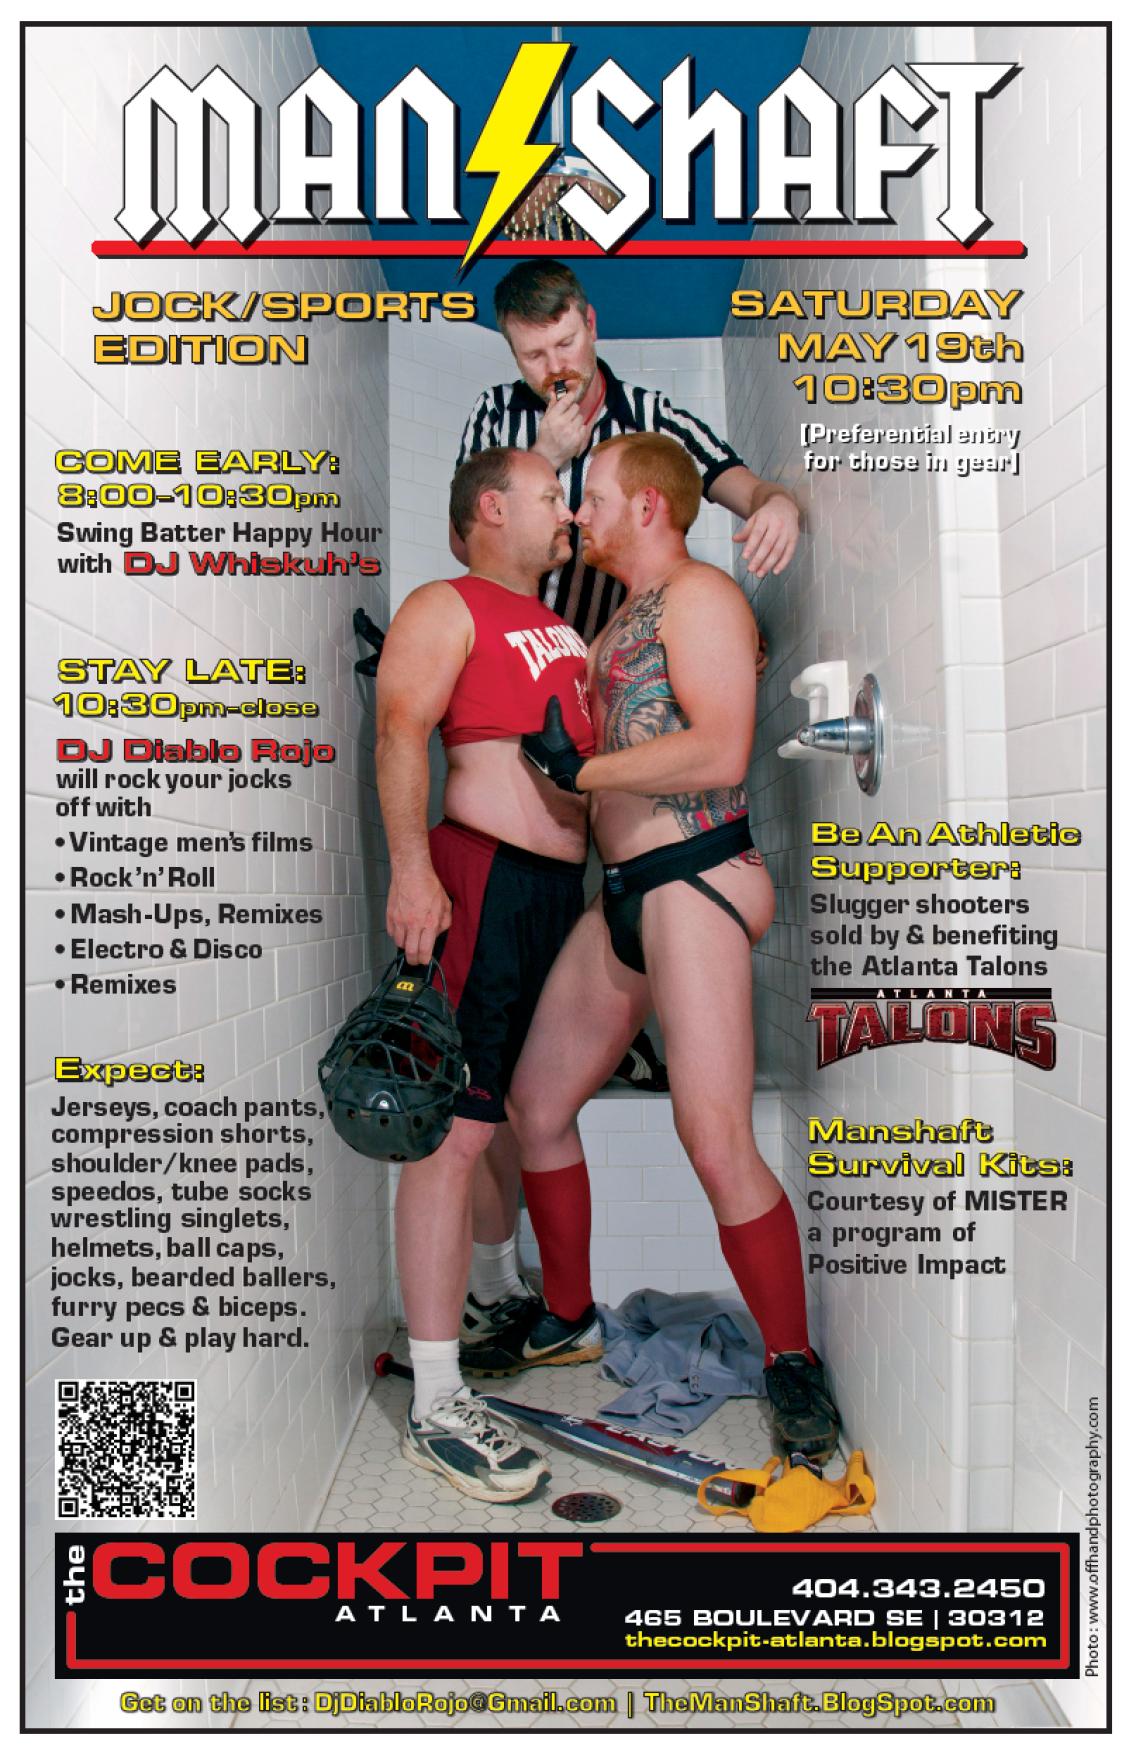 05.19.12: Sports-Jock Edition